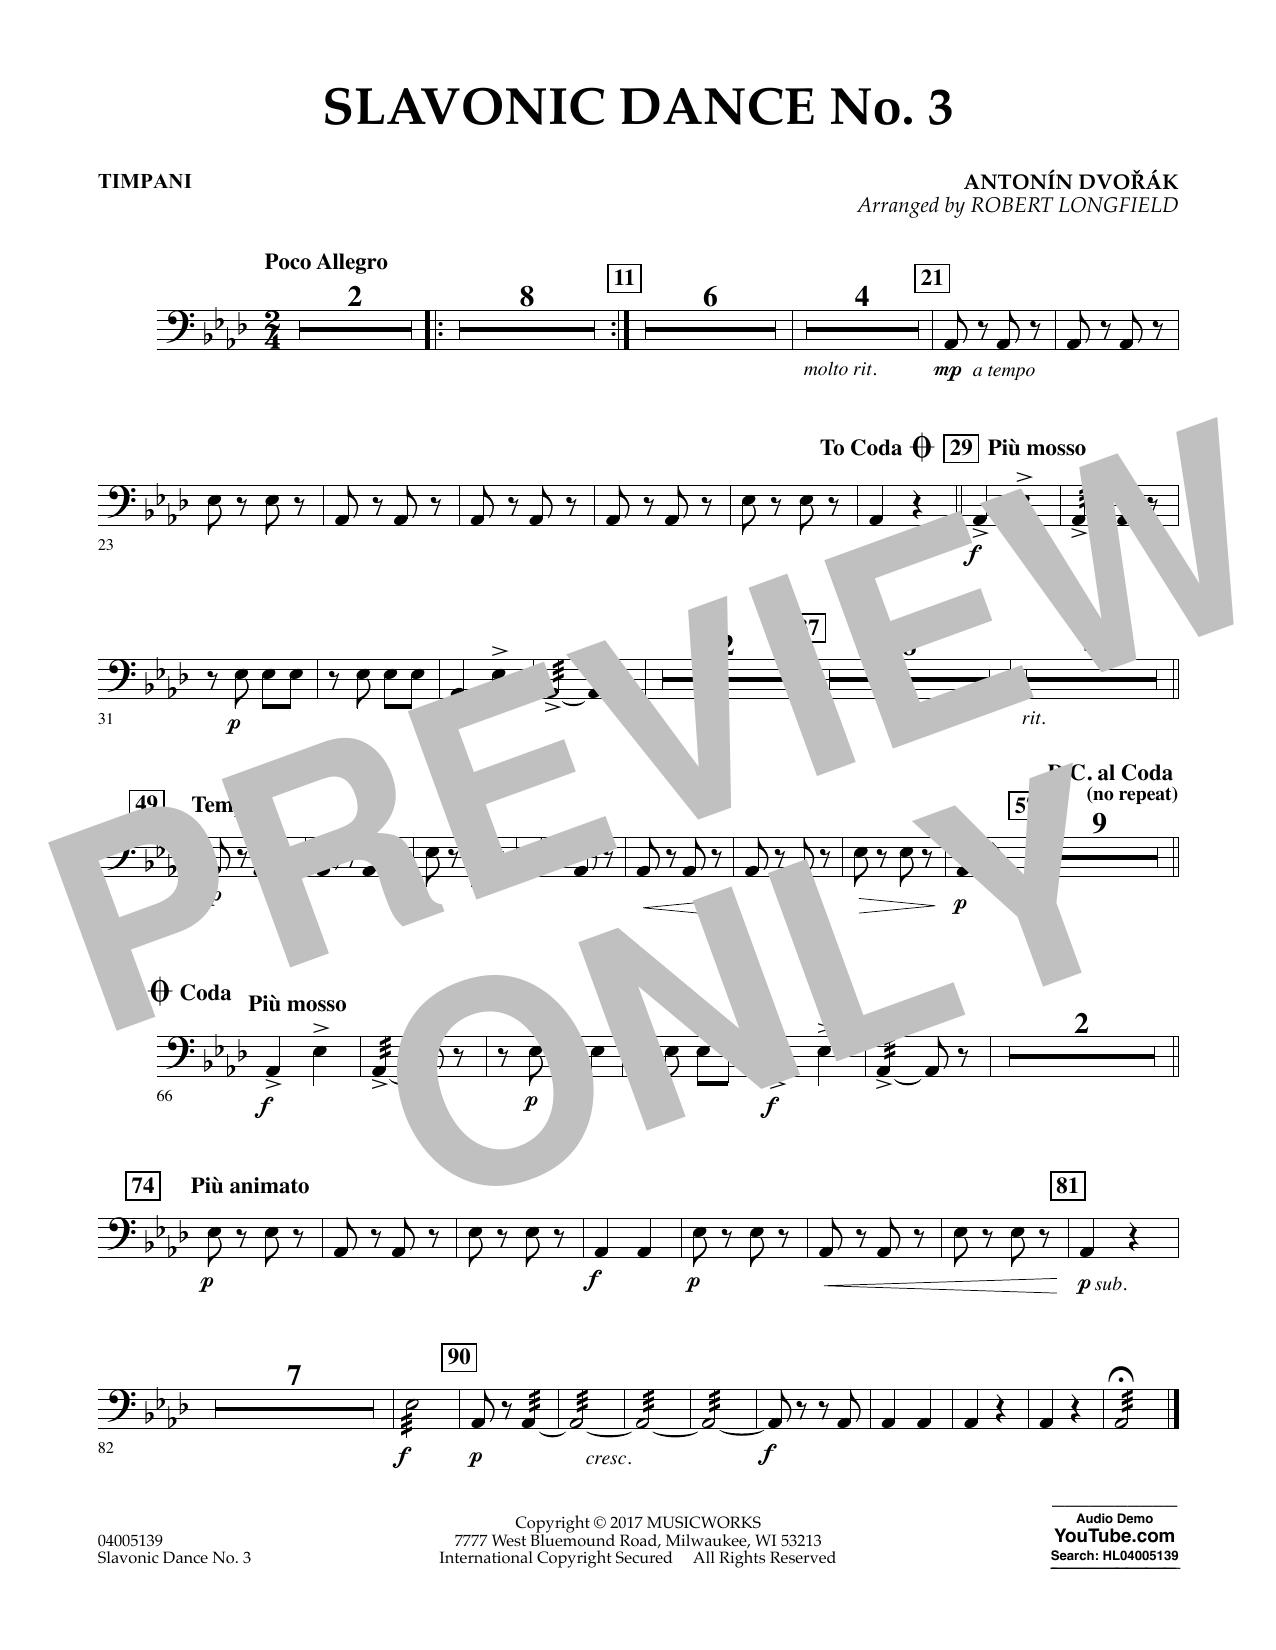 Robert Longfield Slavonic Dance No. 3 - Timpani sheet music notes and chords. Download Printable PDF.